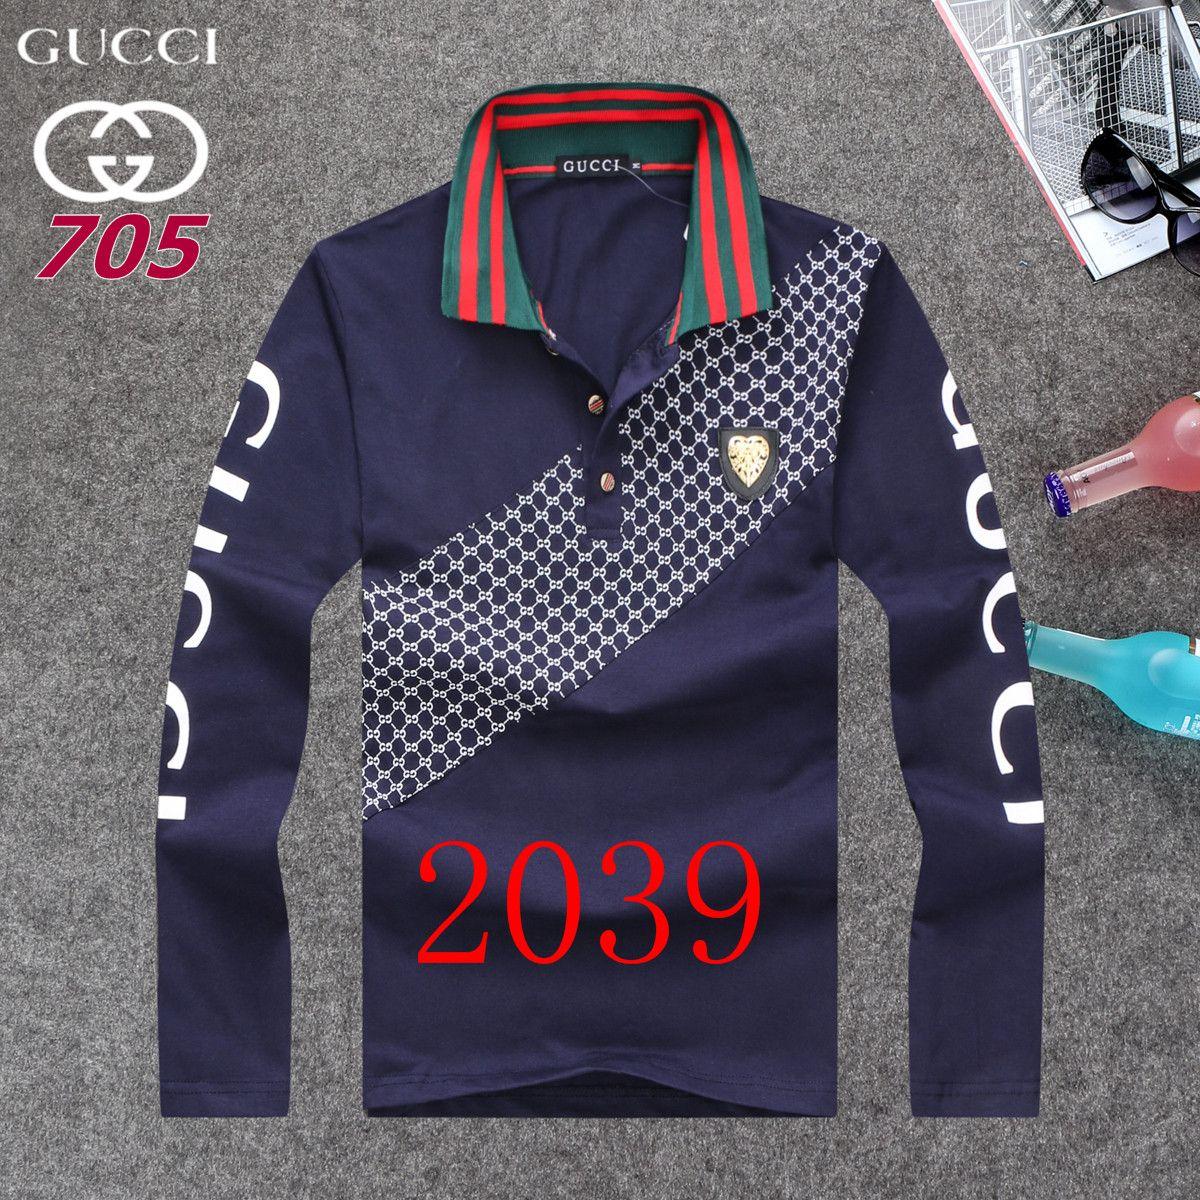 Gucci Long Sleeve Polo Shirts Men Gg86883 Son Polo Shirt Shirts